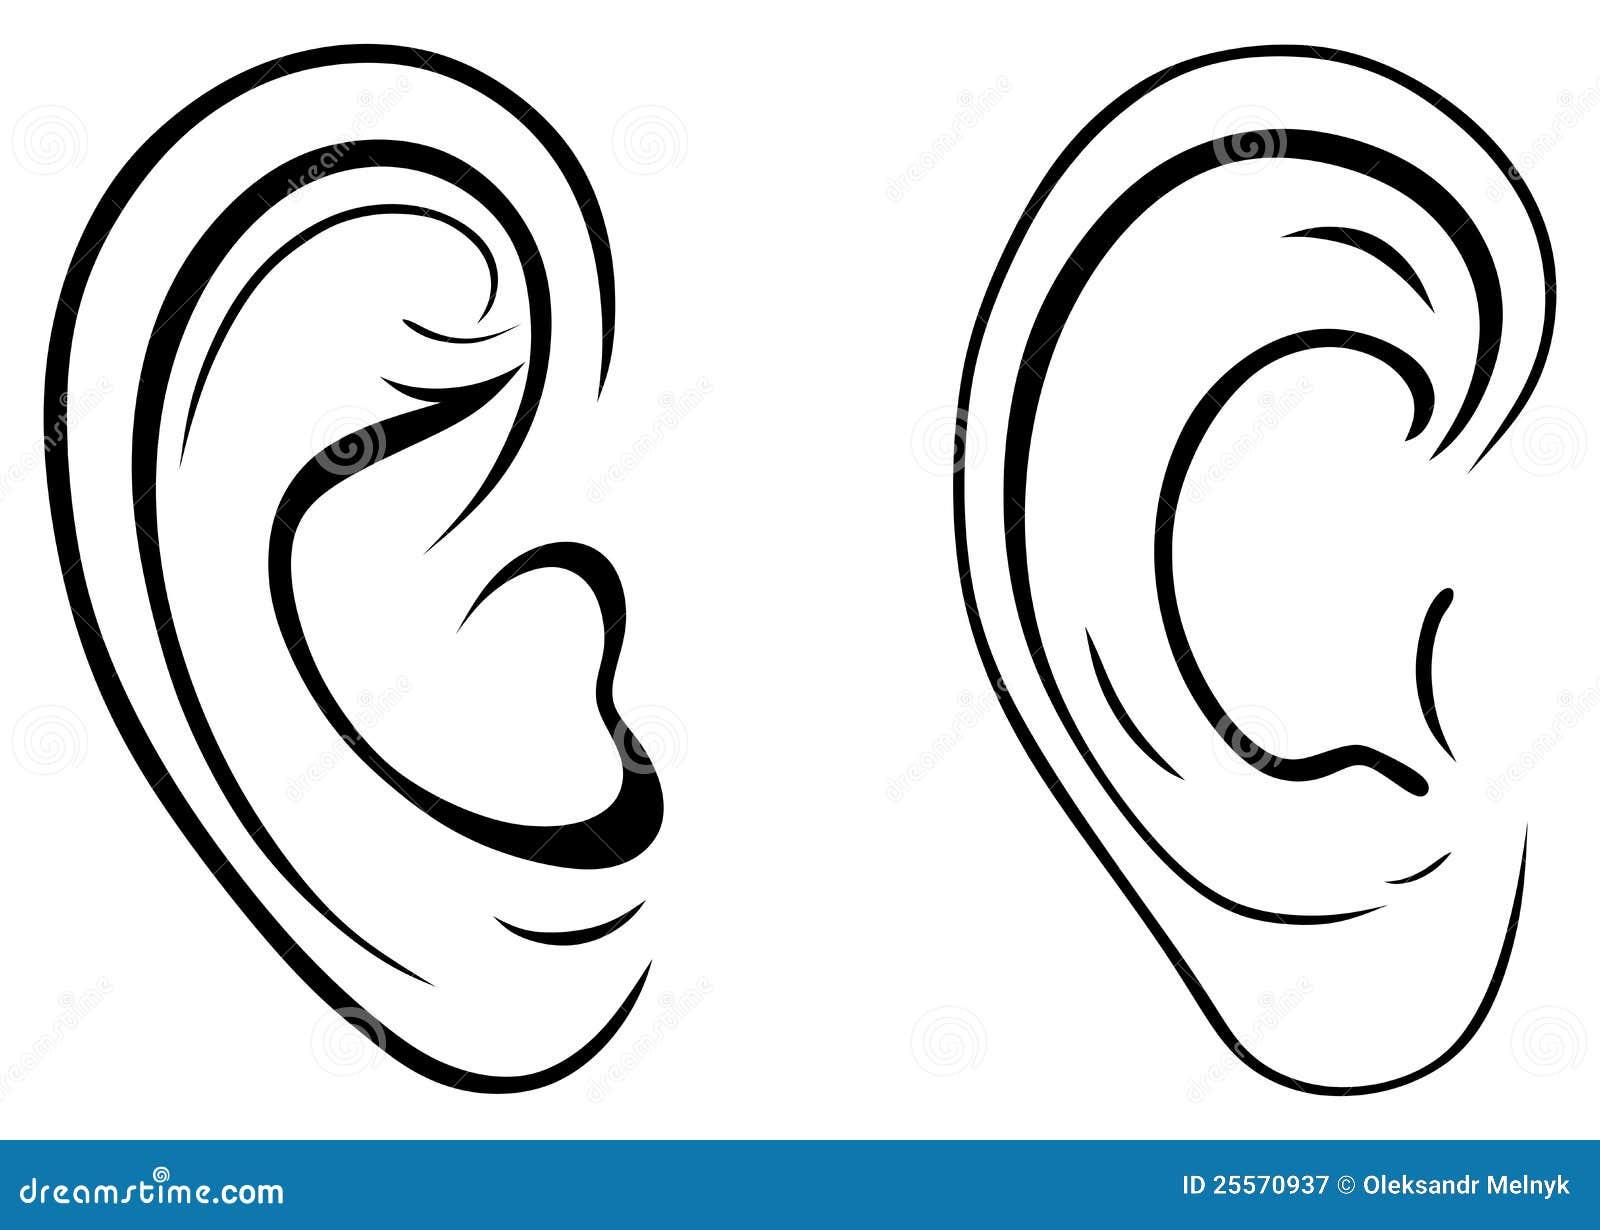 Drawing Human Ear Royalty Free Stock Photography Image 25570937